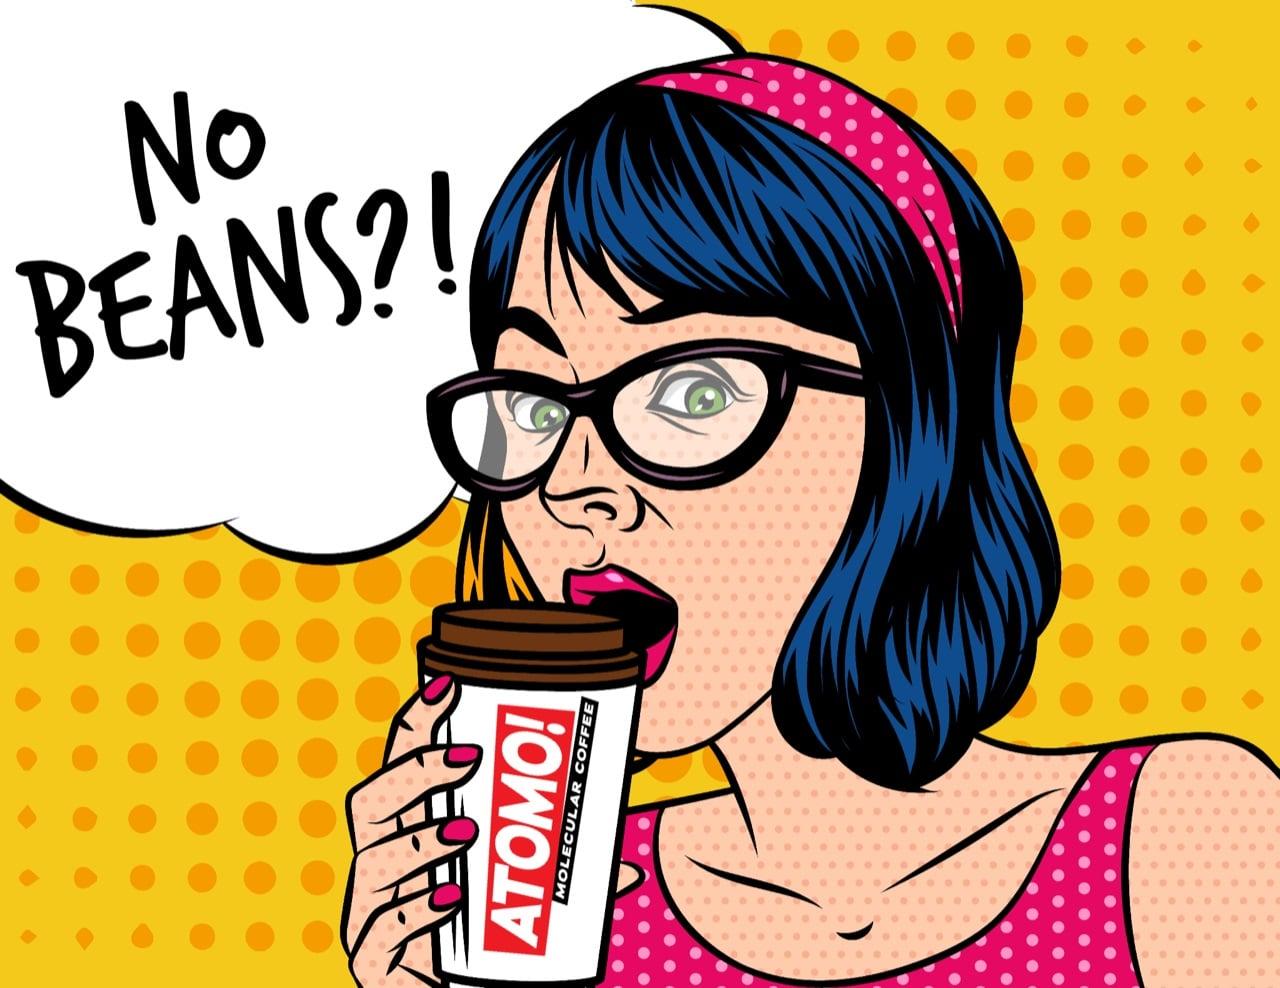 Atomo Coffee Beyond No Beans